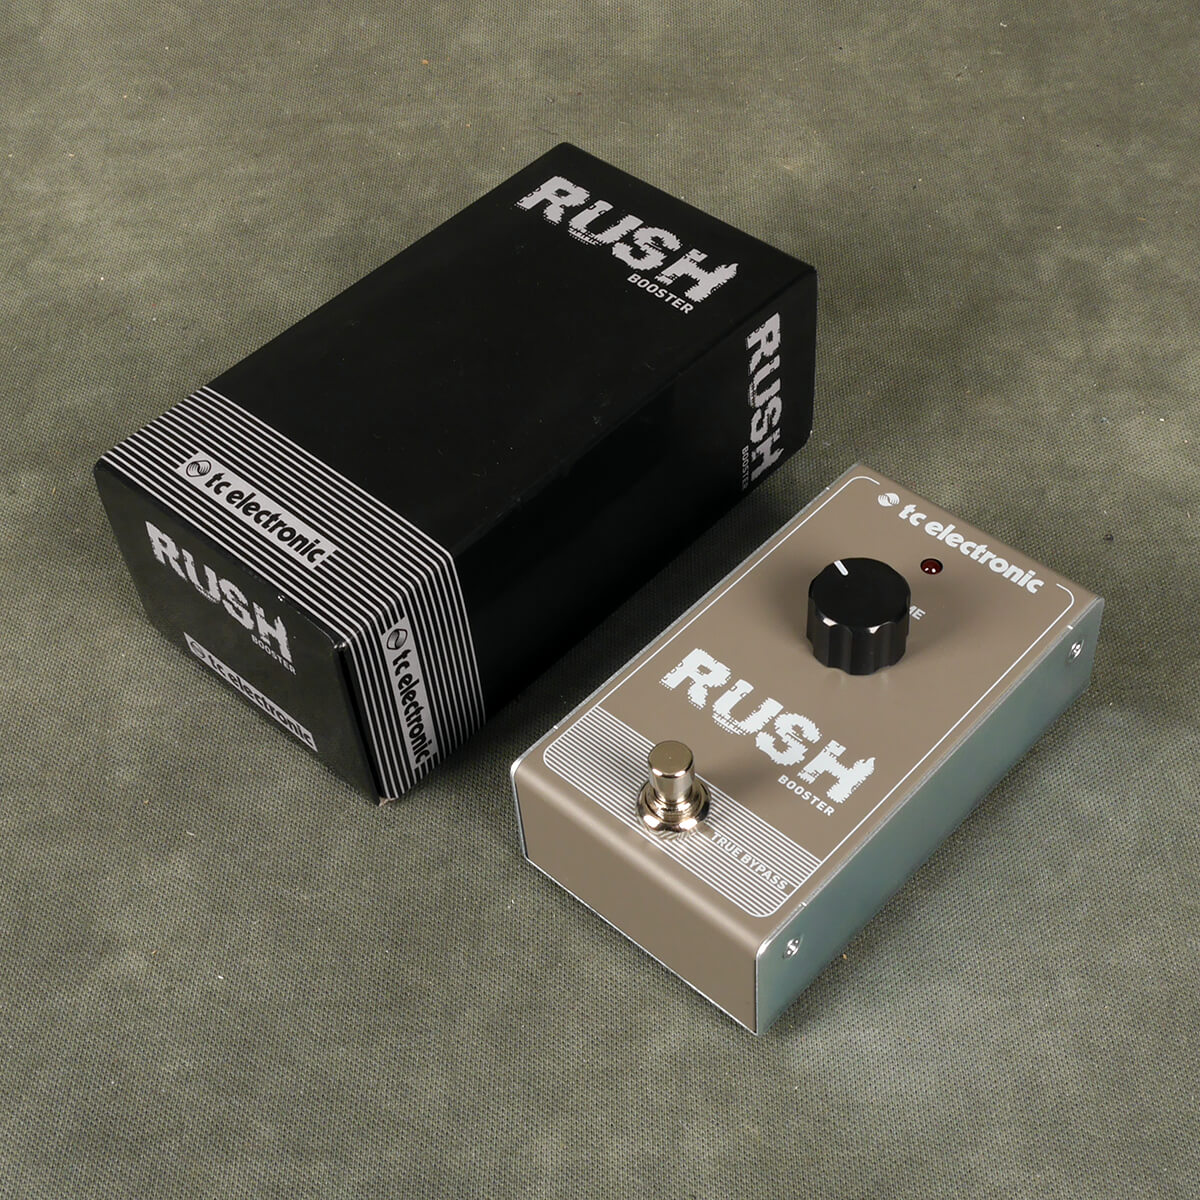 TC Electronics Rush Booster FX Pedal w/Box - 2nd Hand